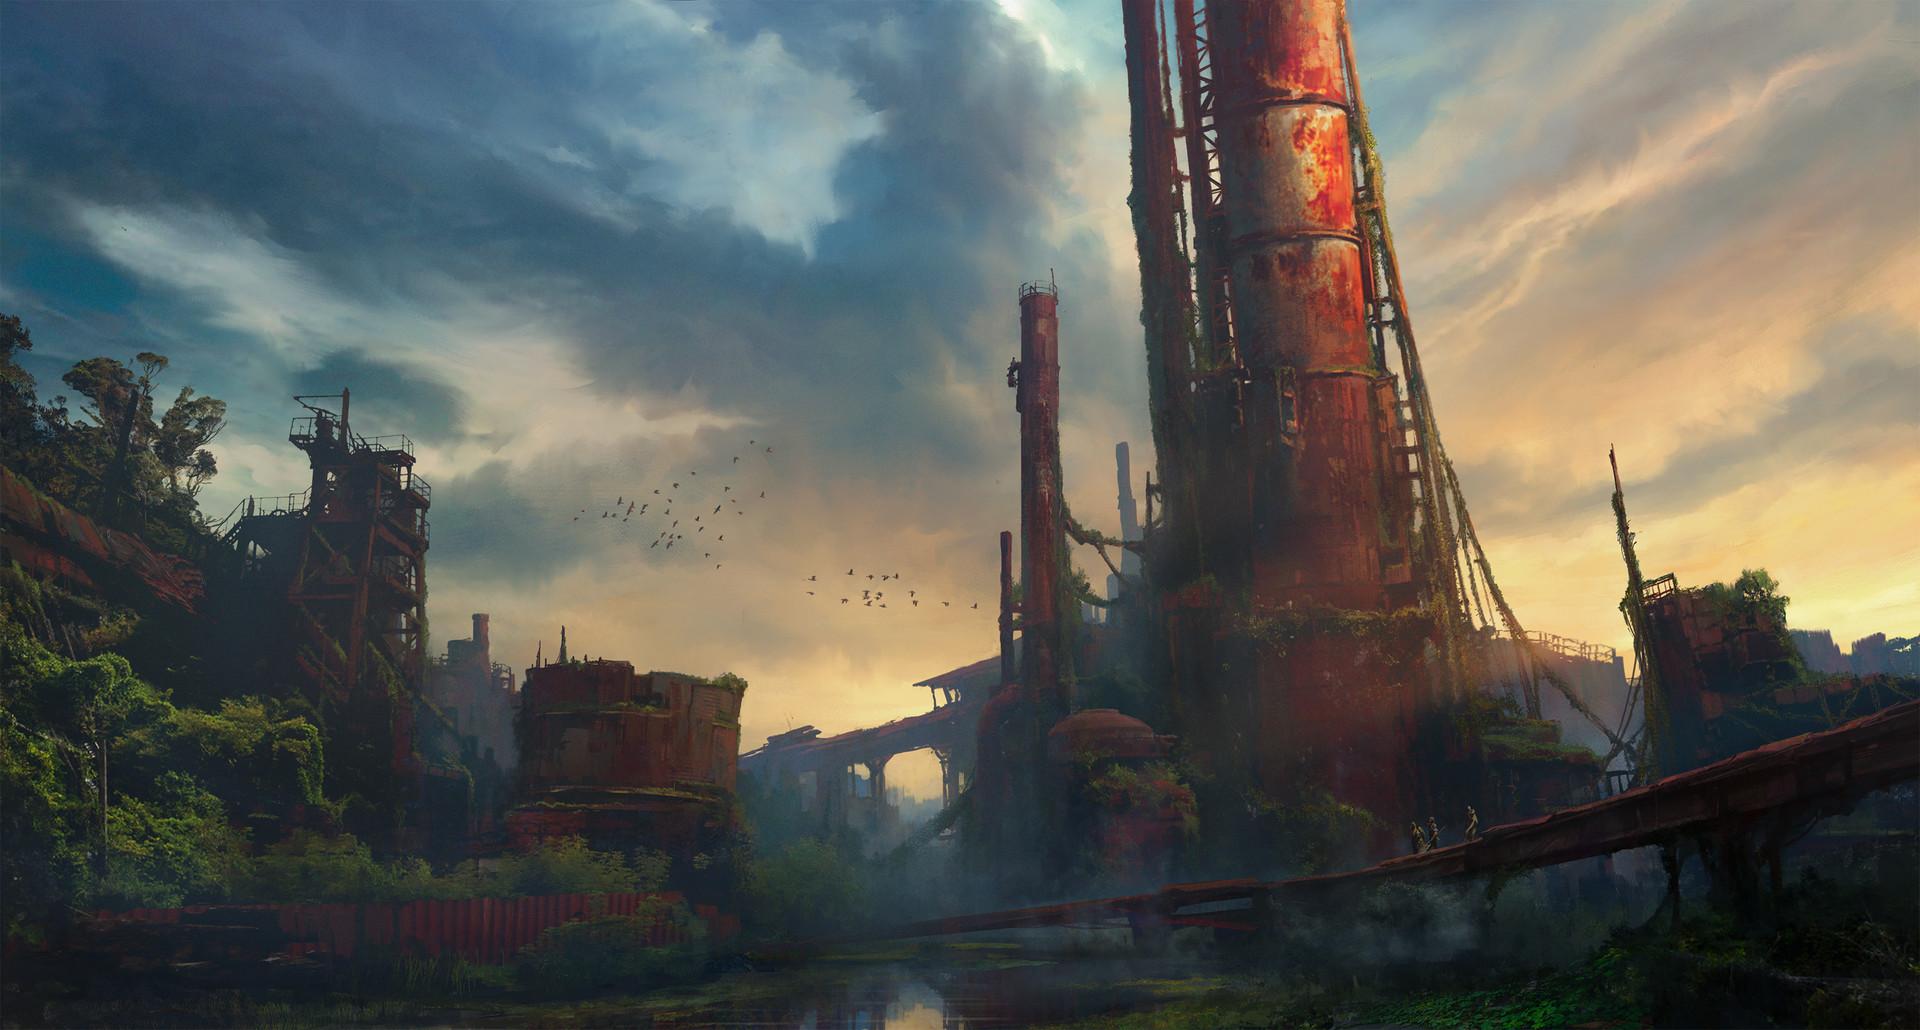 Wallpaper : environment, ruins